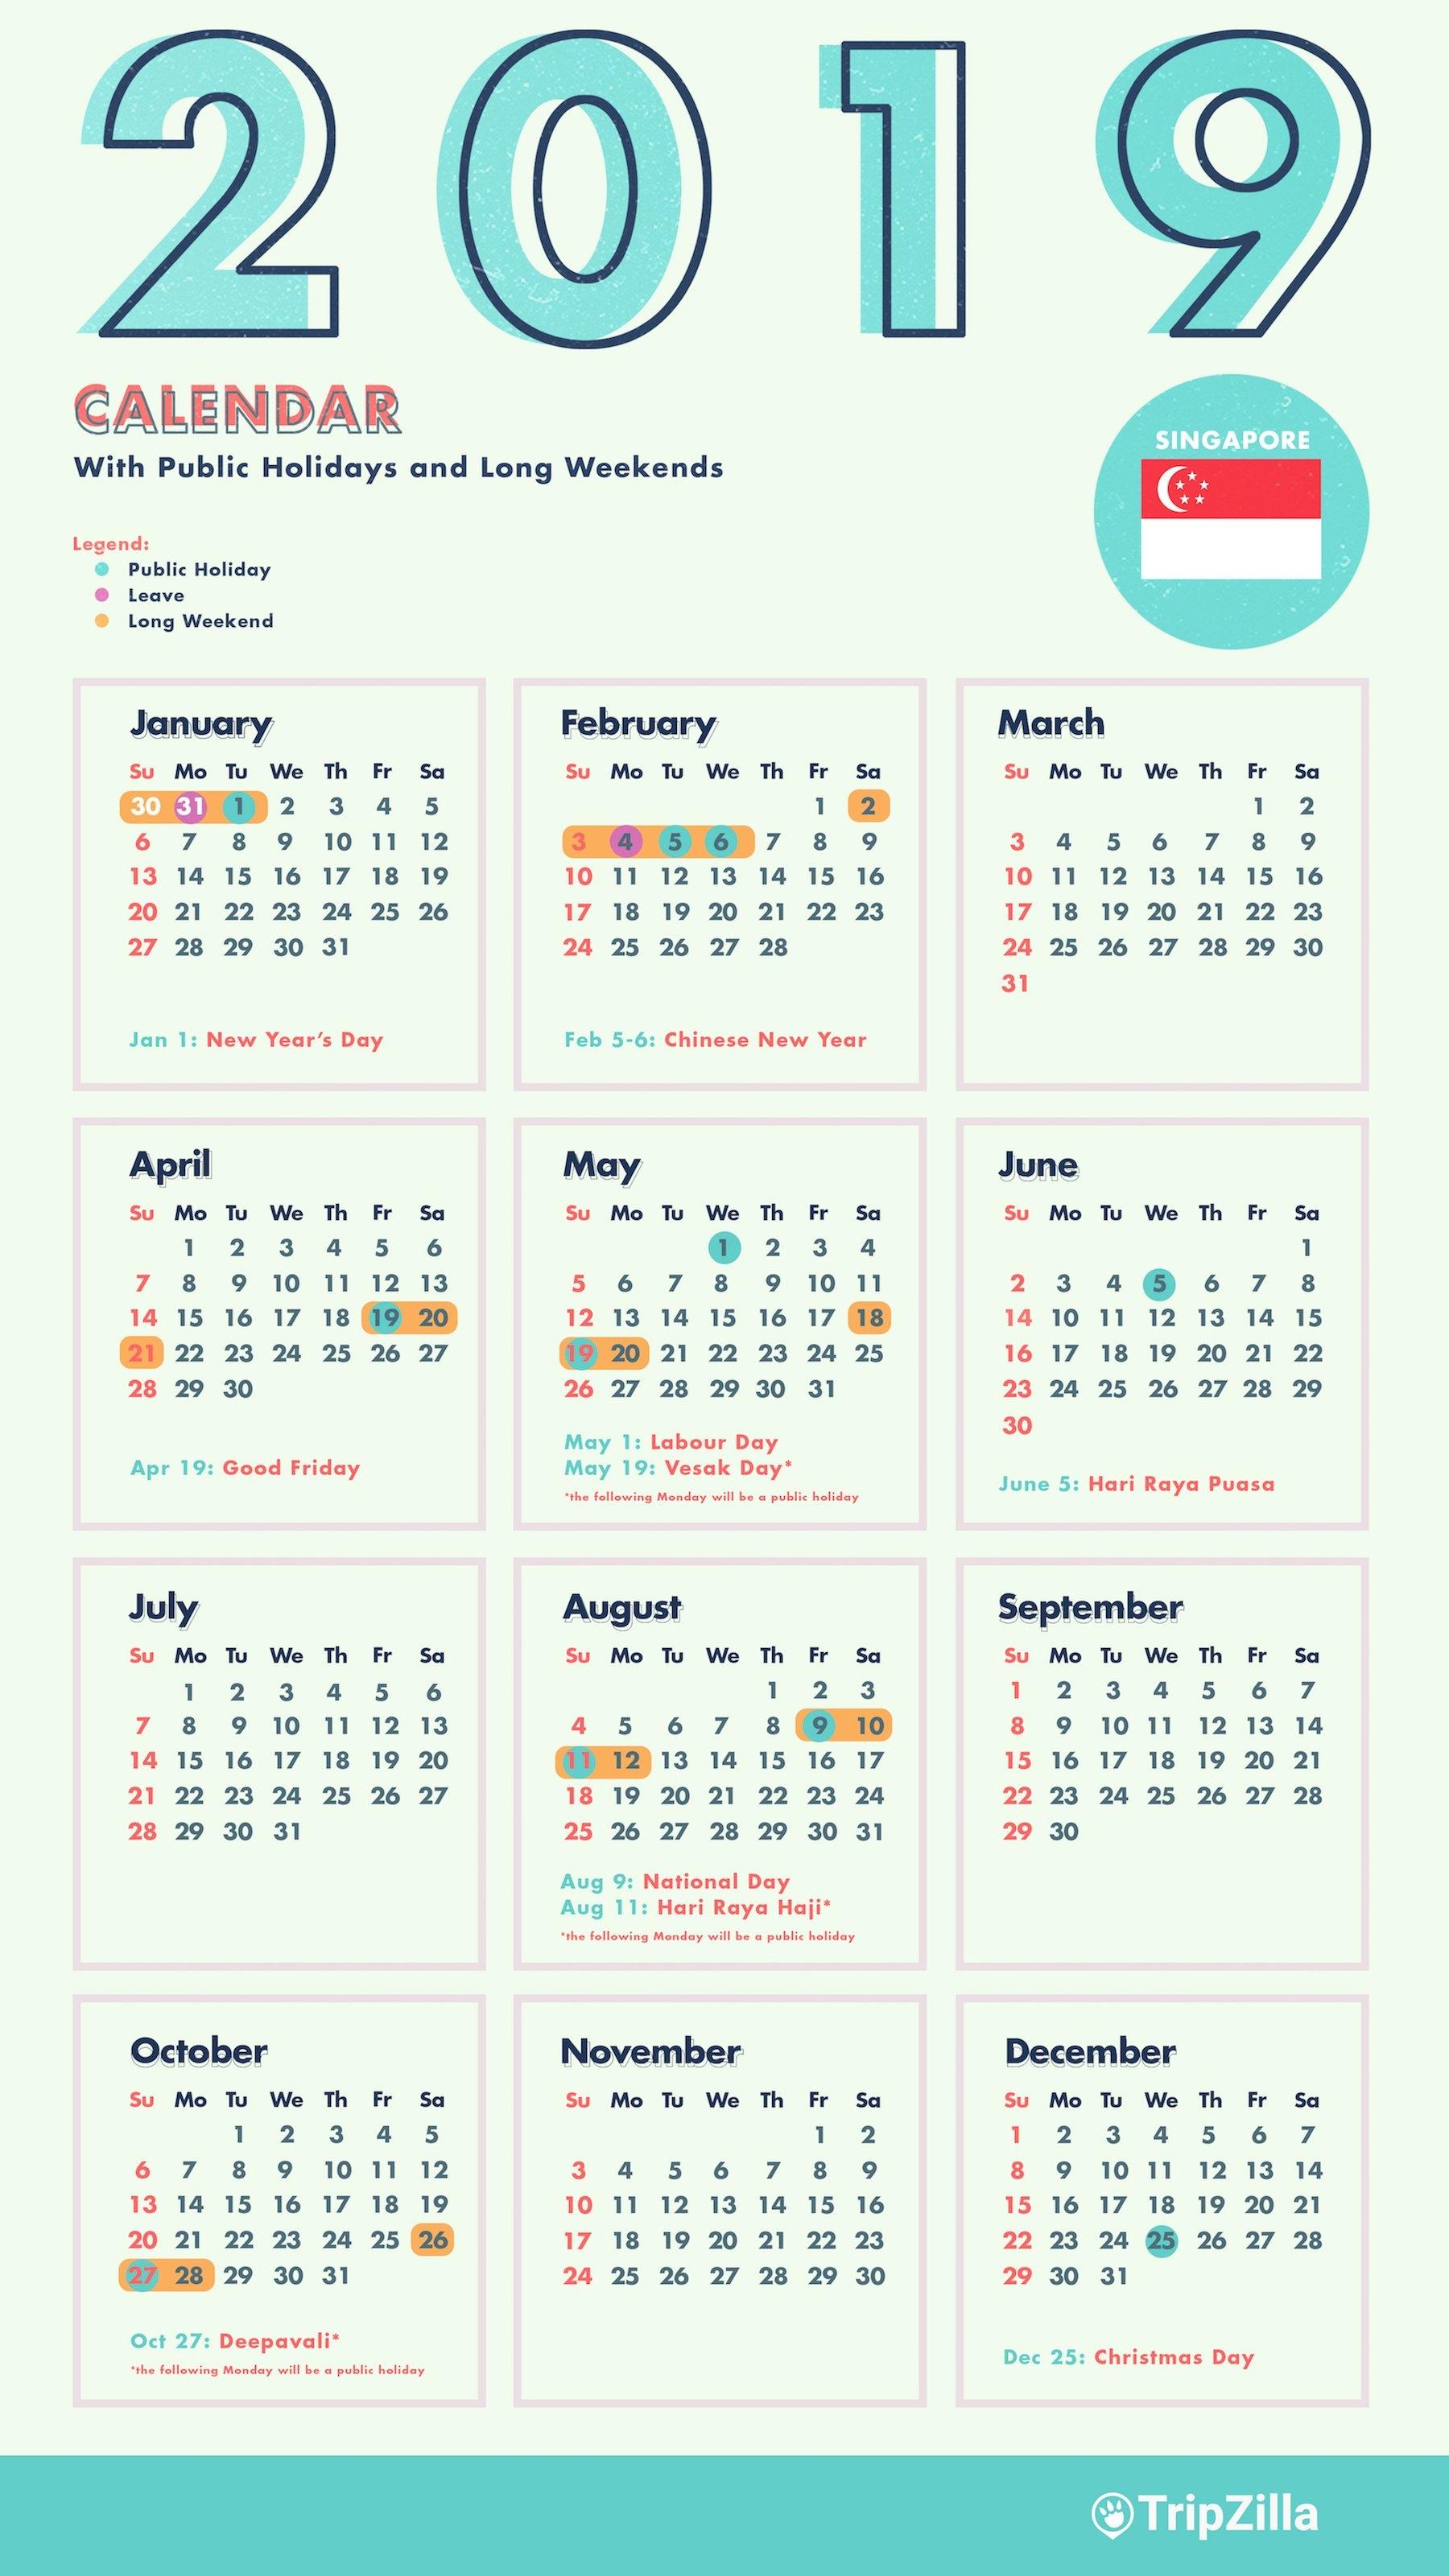 6 Long Weekends In Singapore In 2019 (Bonus Calendar & Cheatsheet) Calendar 2019 National Days